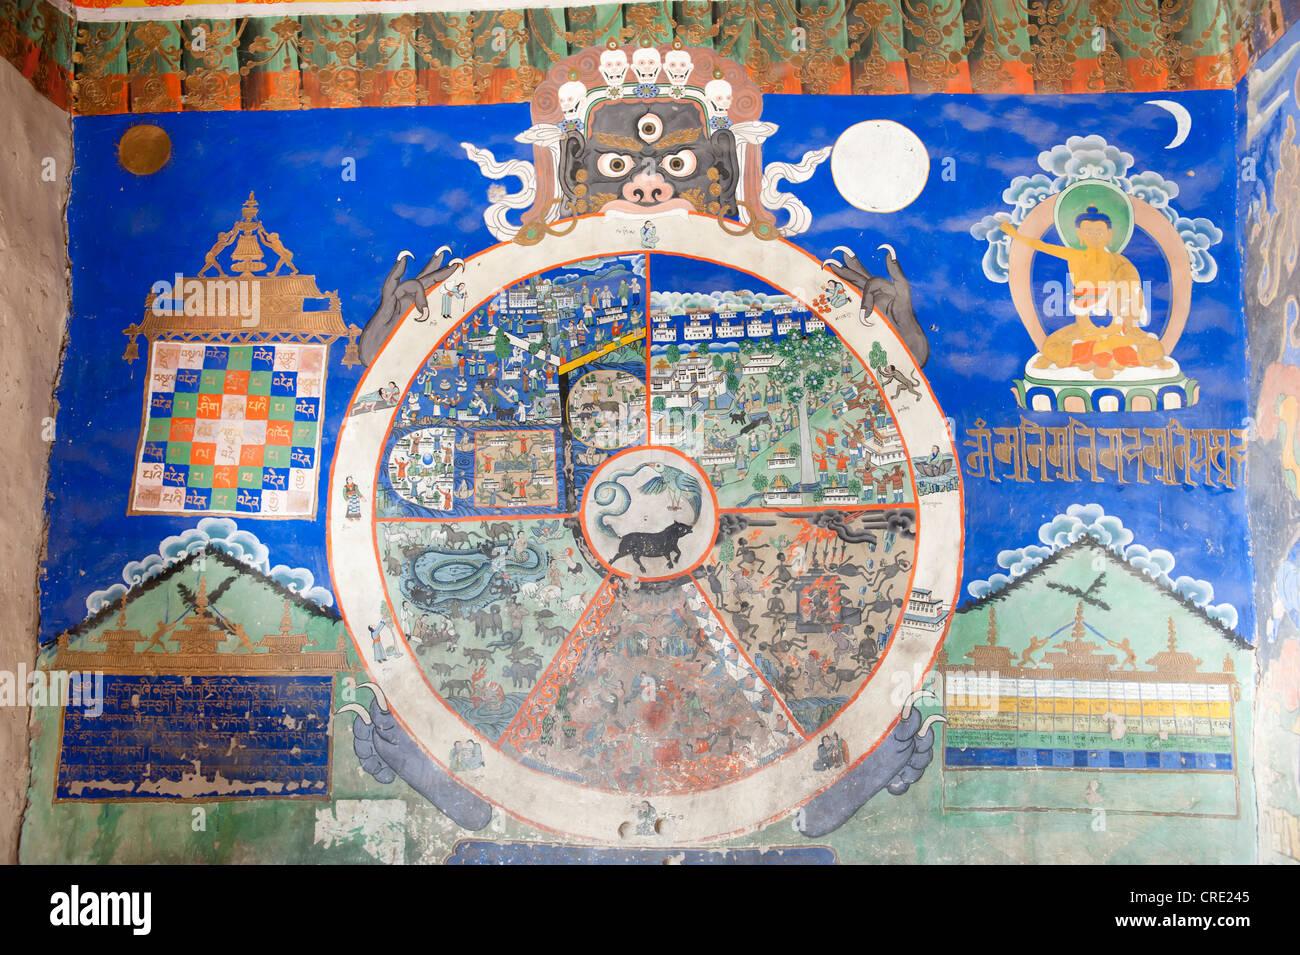 Tibetan Buddhism Yama God Of Death Holding The Wheel Of Life Stock Photo Alamy